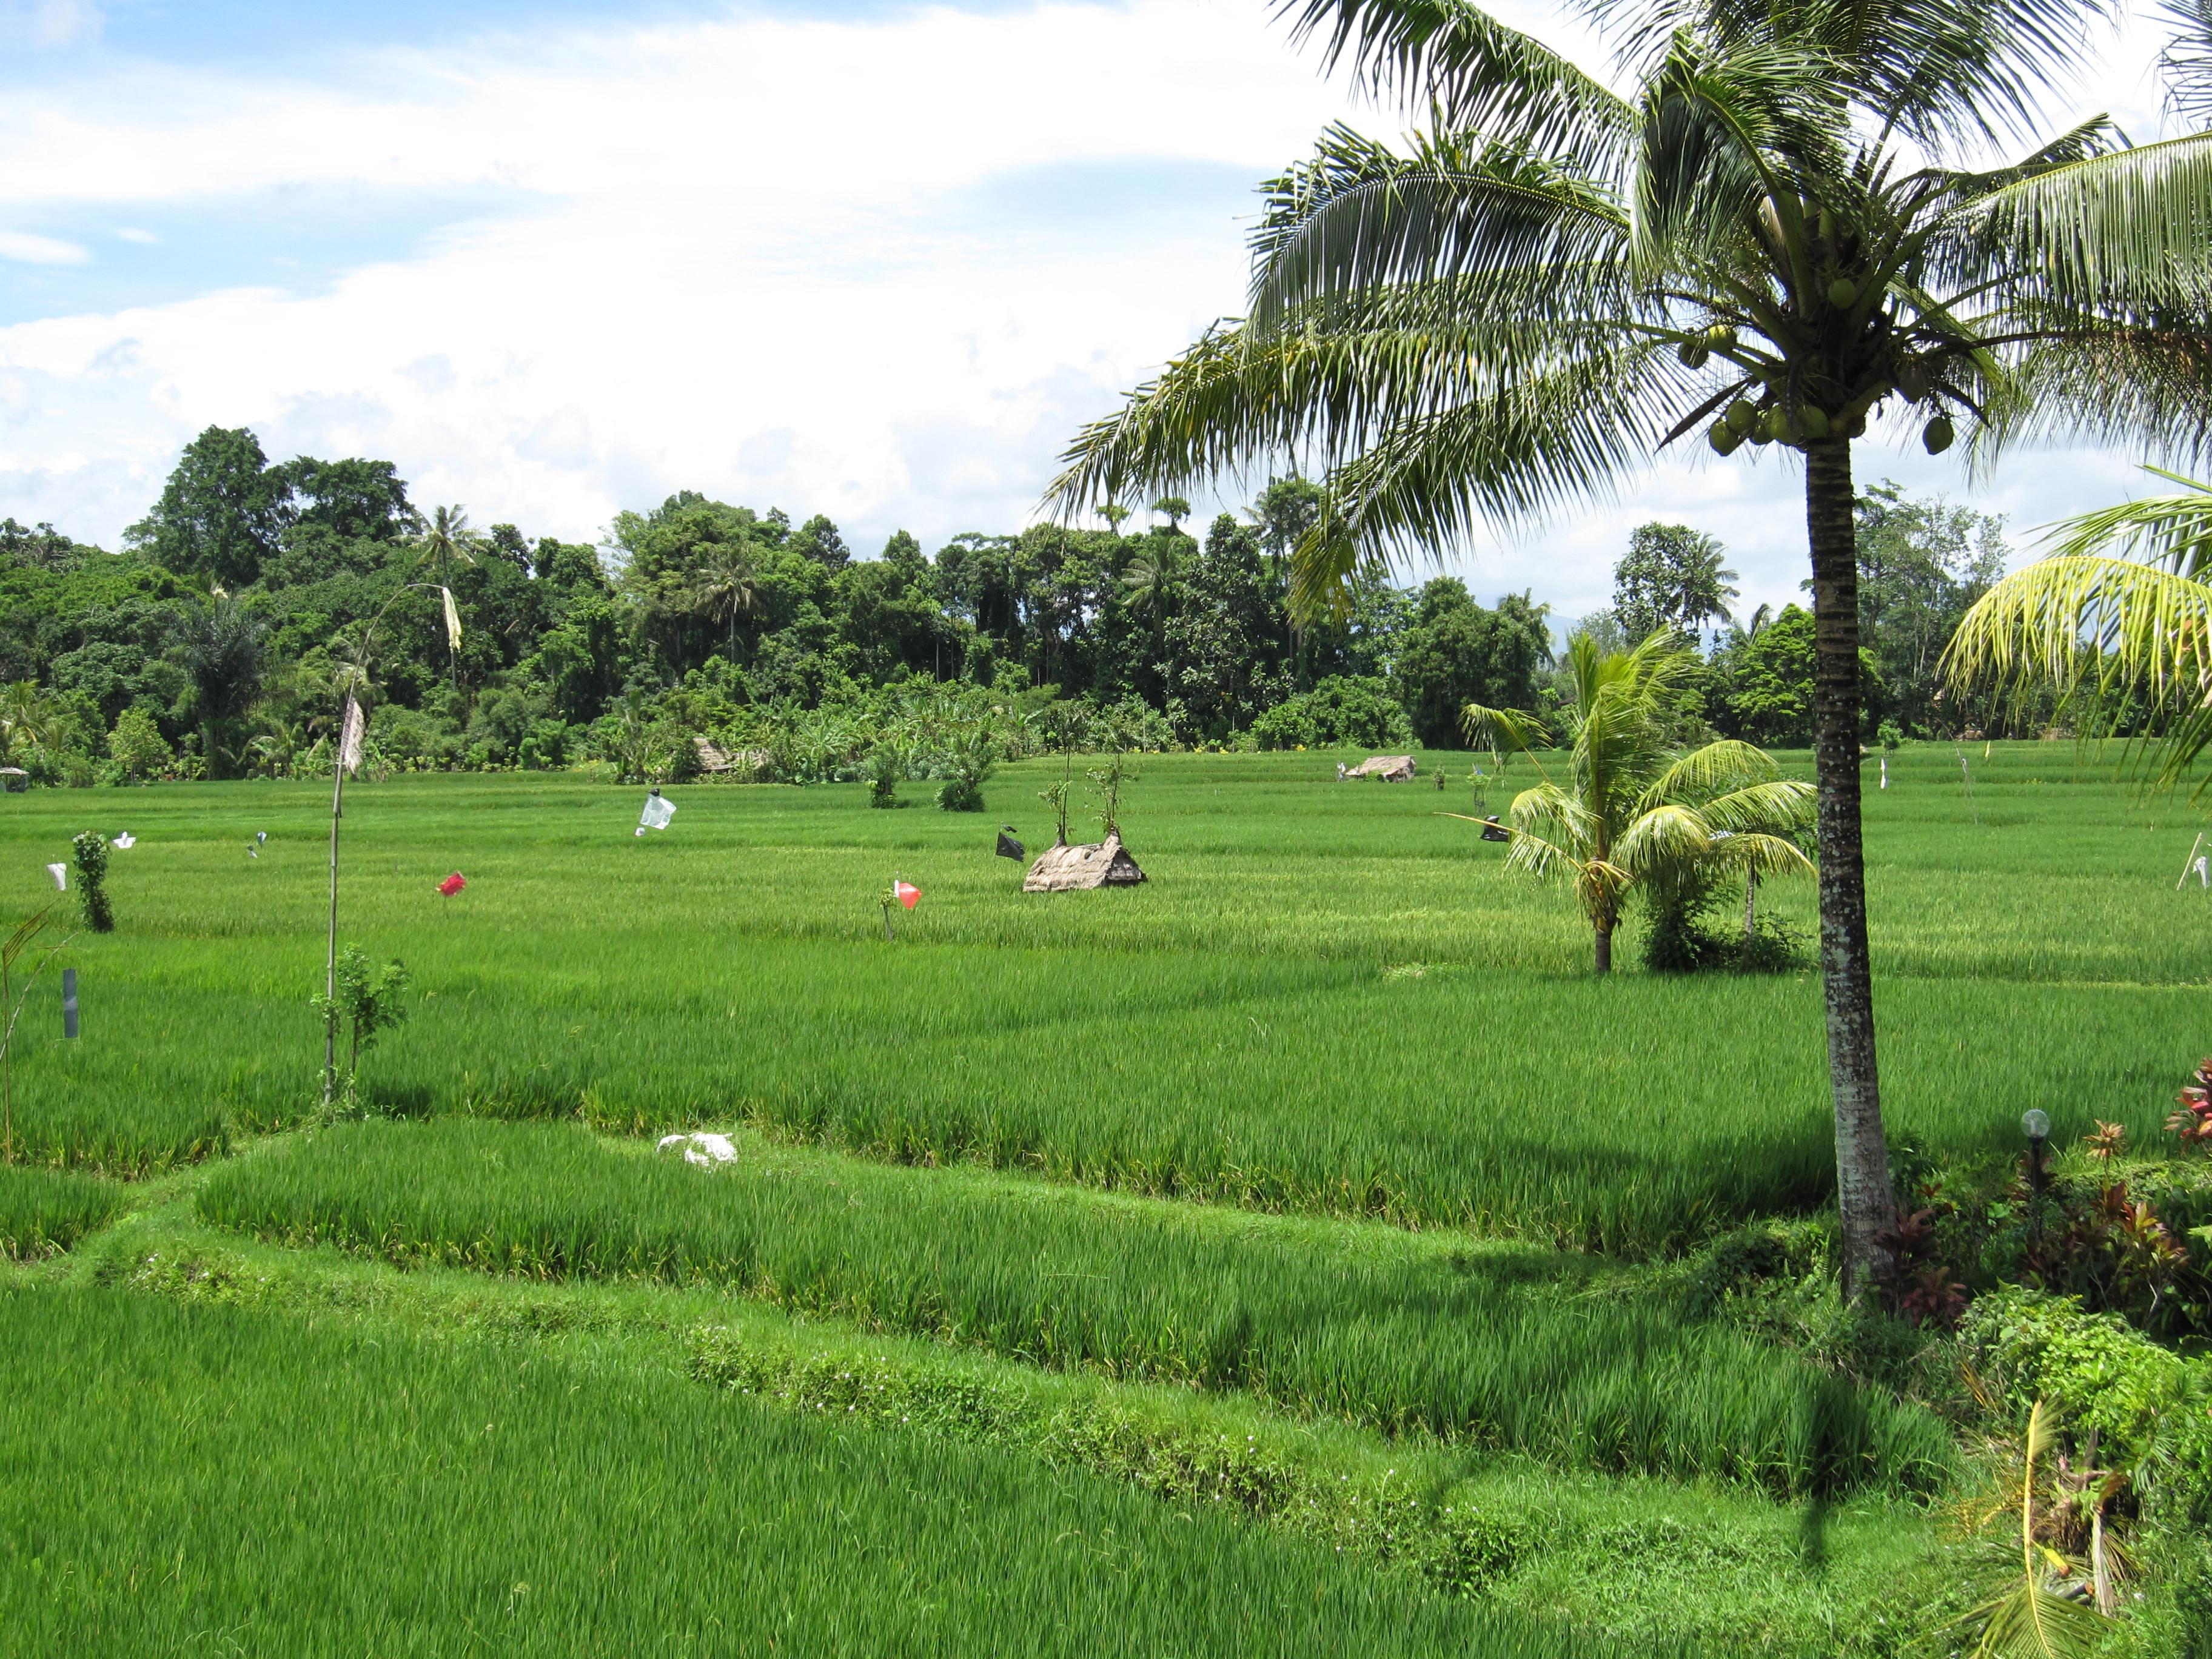 Green Rice Fields in Bali | Half Year Spin | Gyan, Ram, Rena, and Jeev